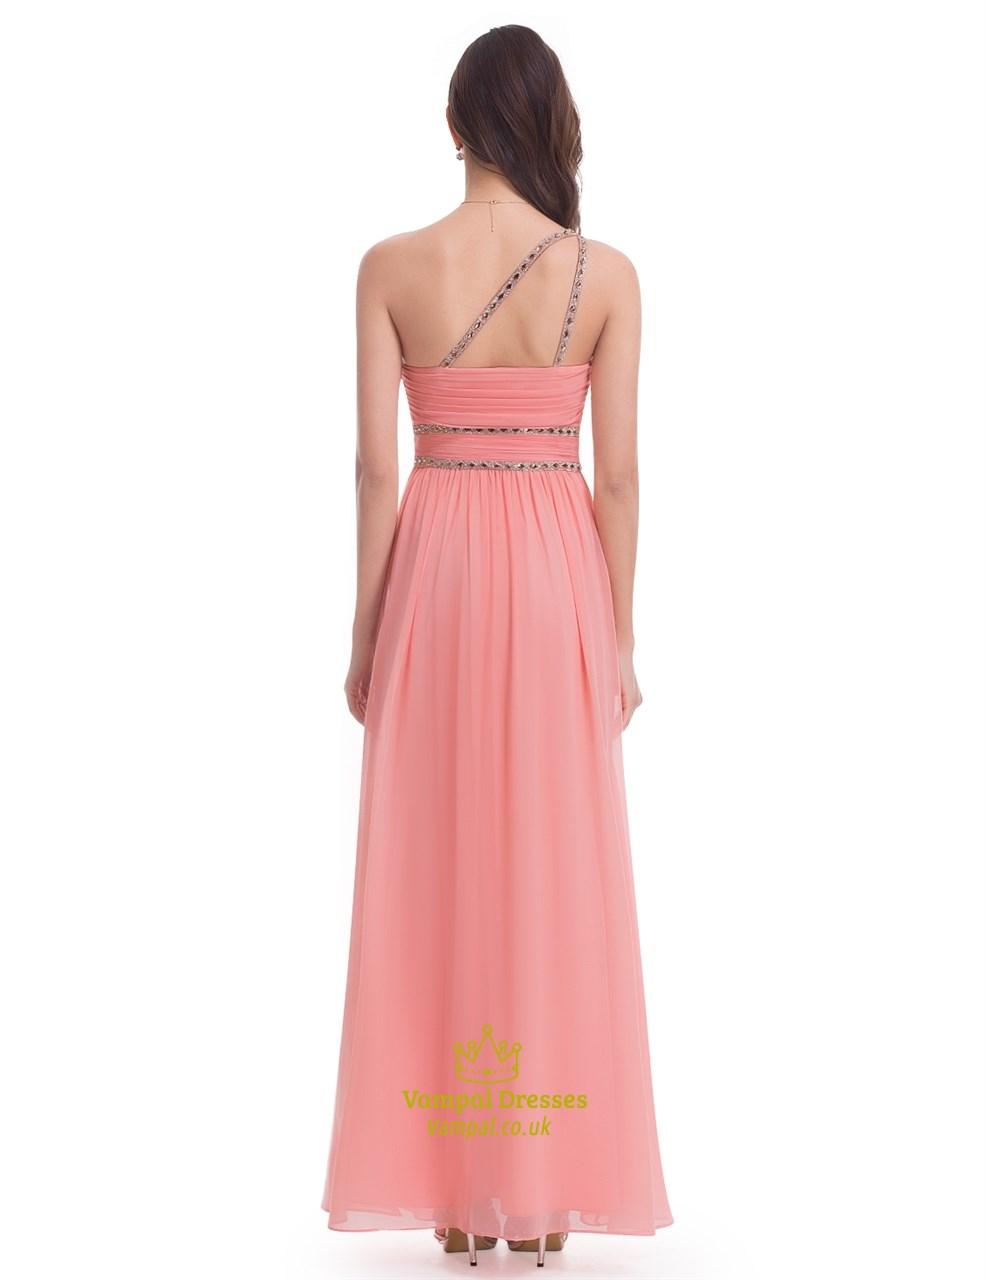 Salmon Chiffon Sleeveless One Shoulder Bridesmaid Dress